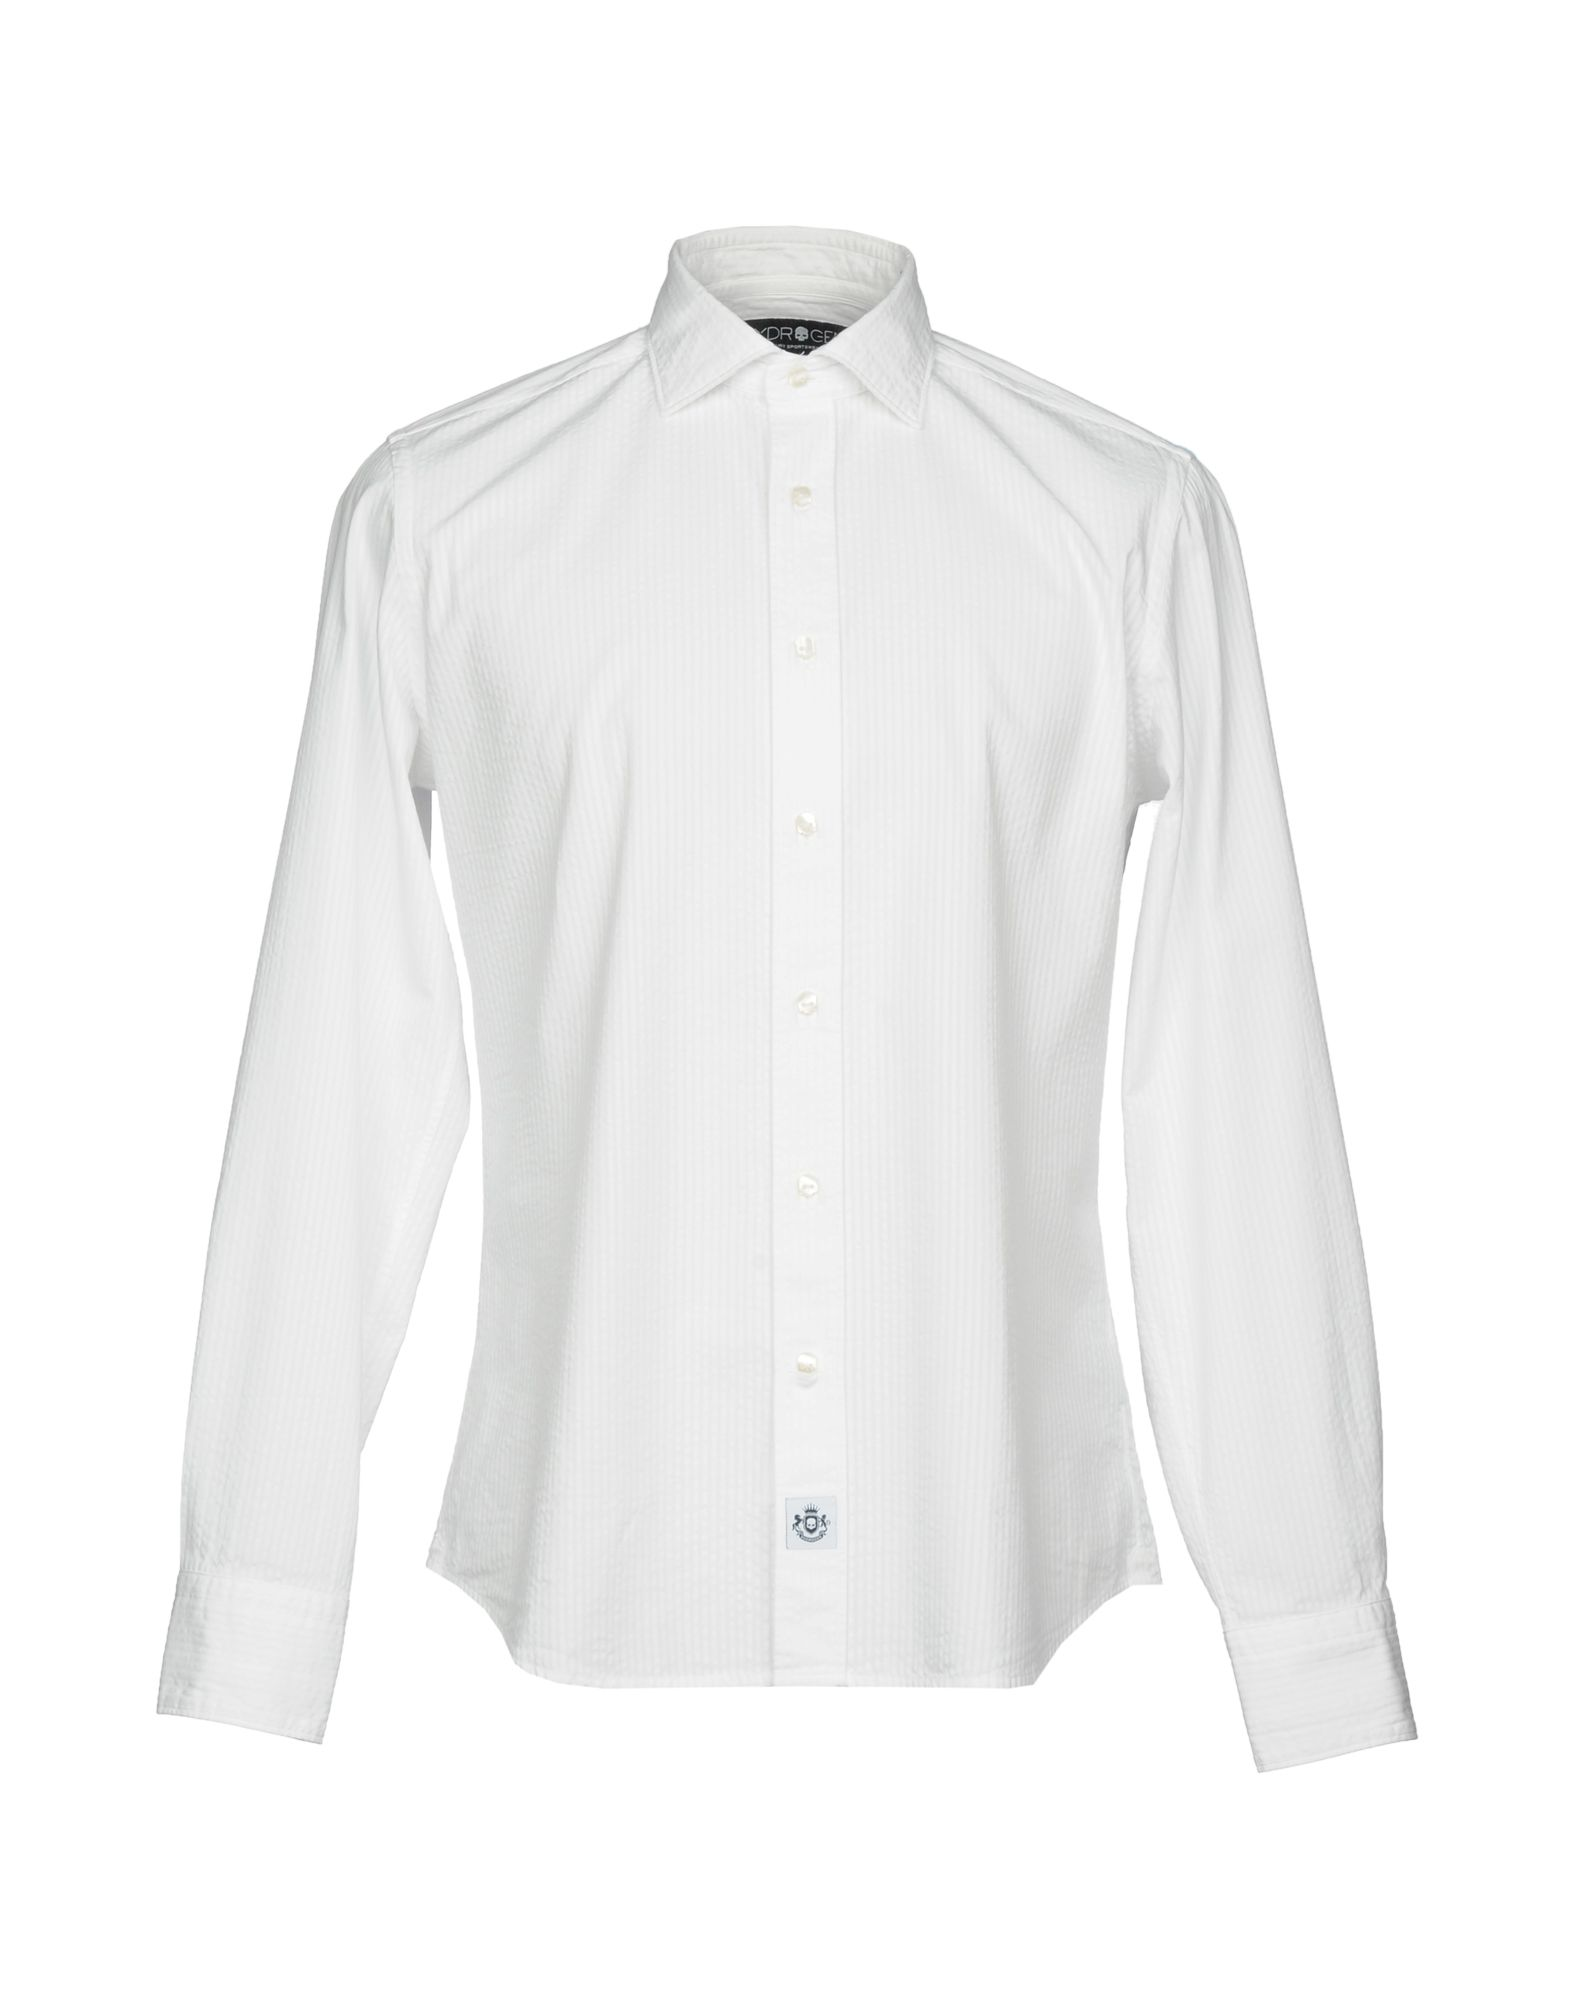 Camicia Tinta Unita Hydrogen Uomo - Acquista online su